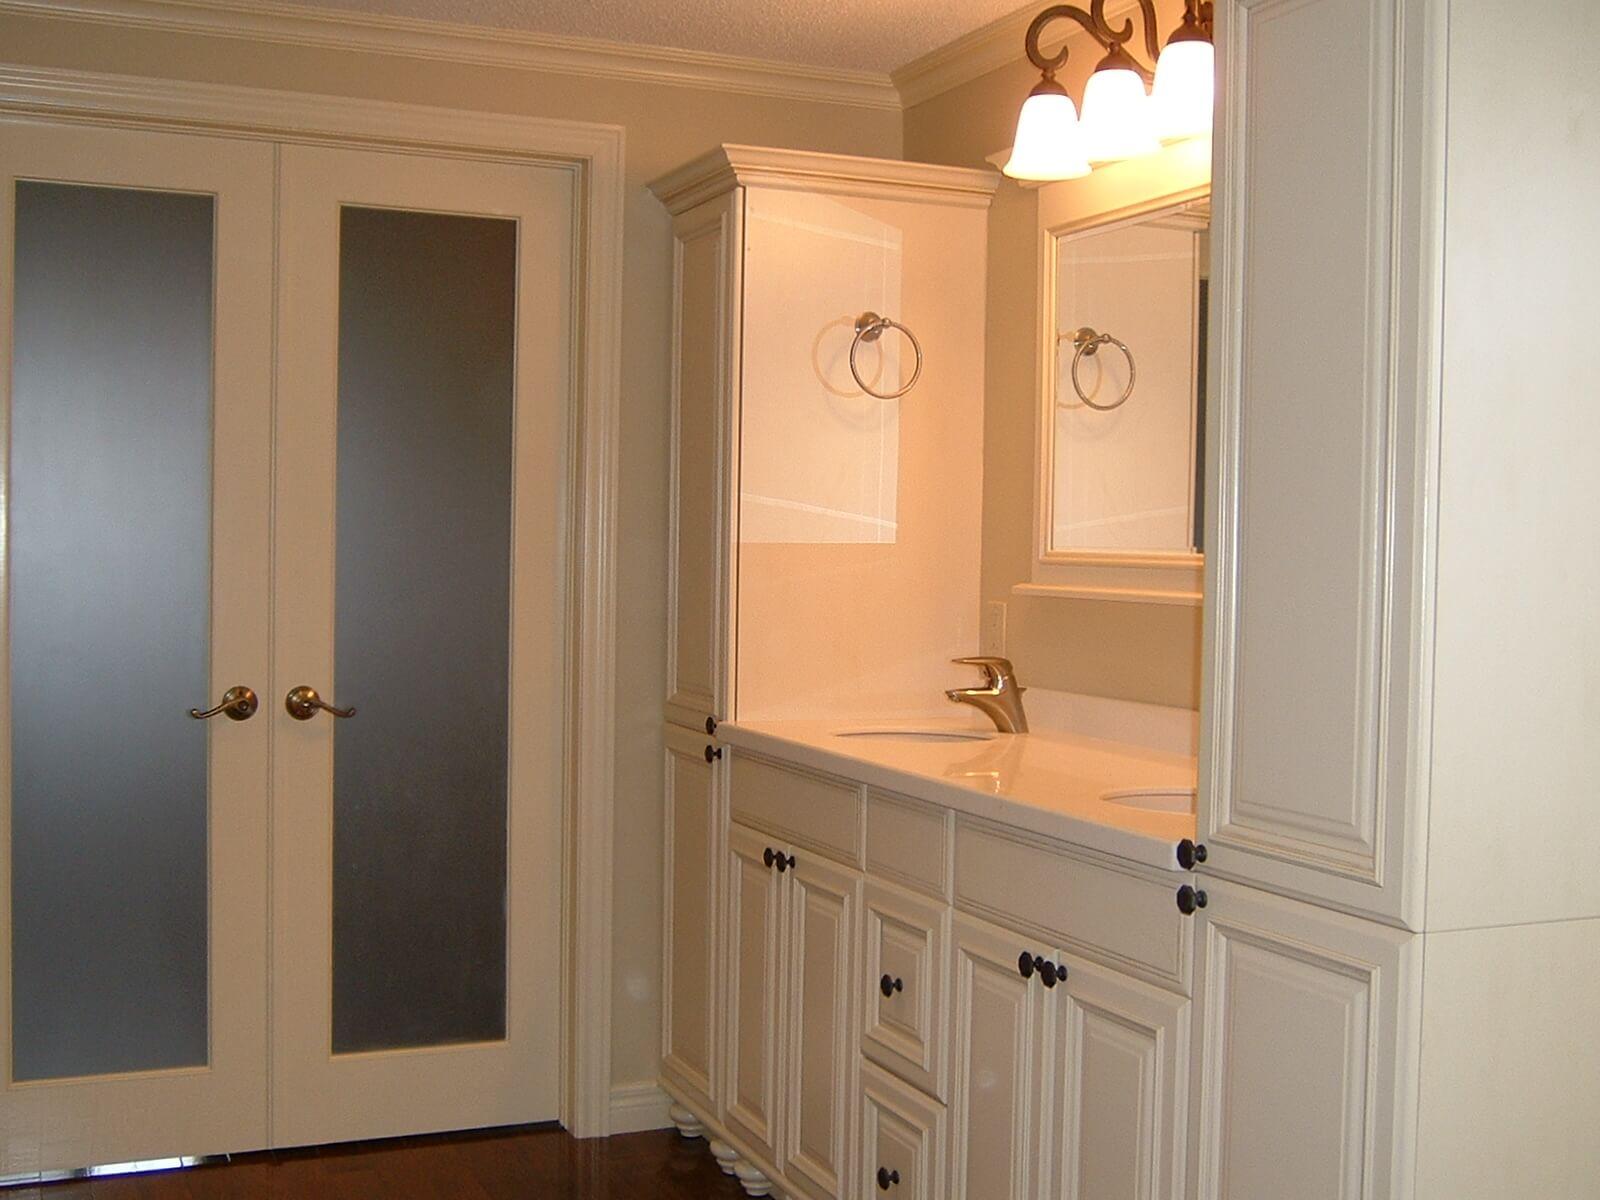 pin irishartsblog basement bulkhead com a classic basementdoors doors door give